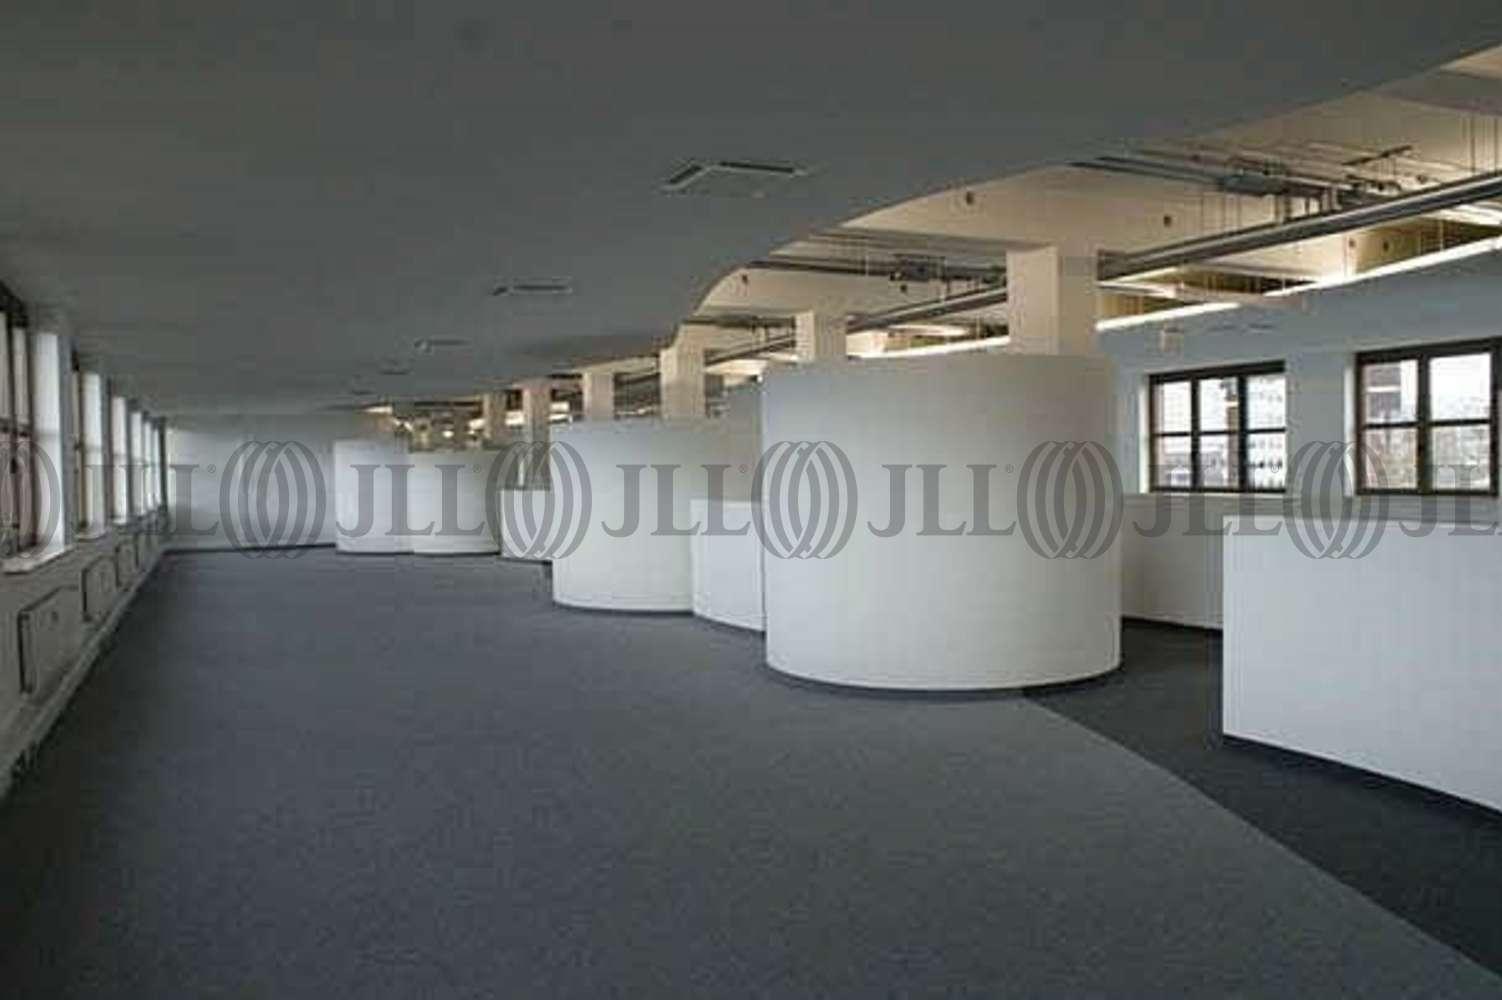 Büros Frankfurt am main, 60486 - Büro - Frankfurt am Main, Bockenheim - F0170 - 10934336